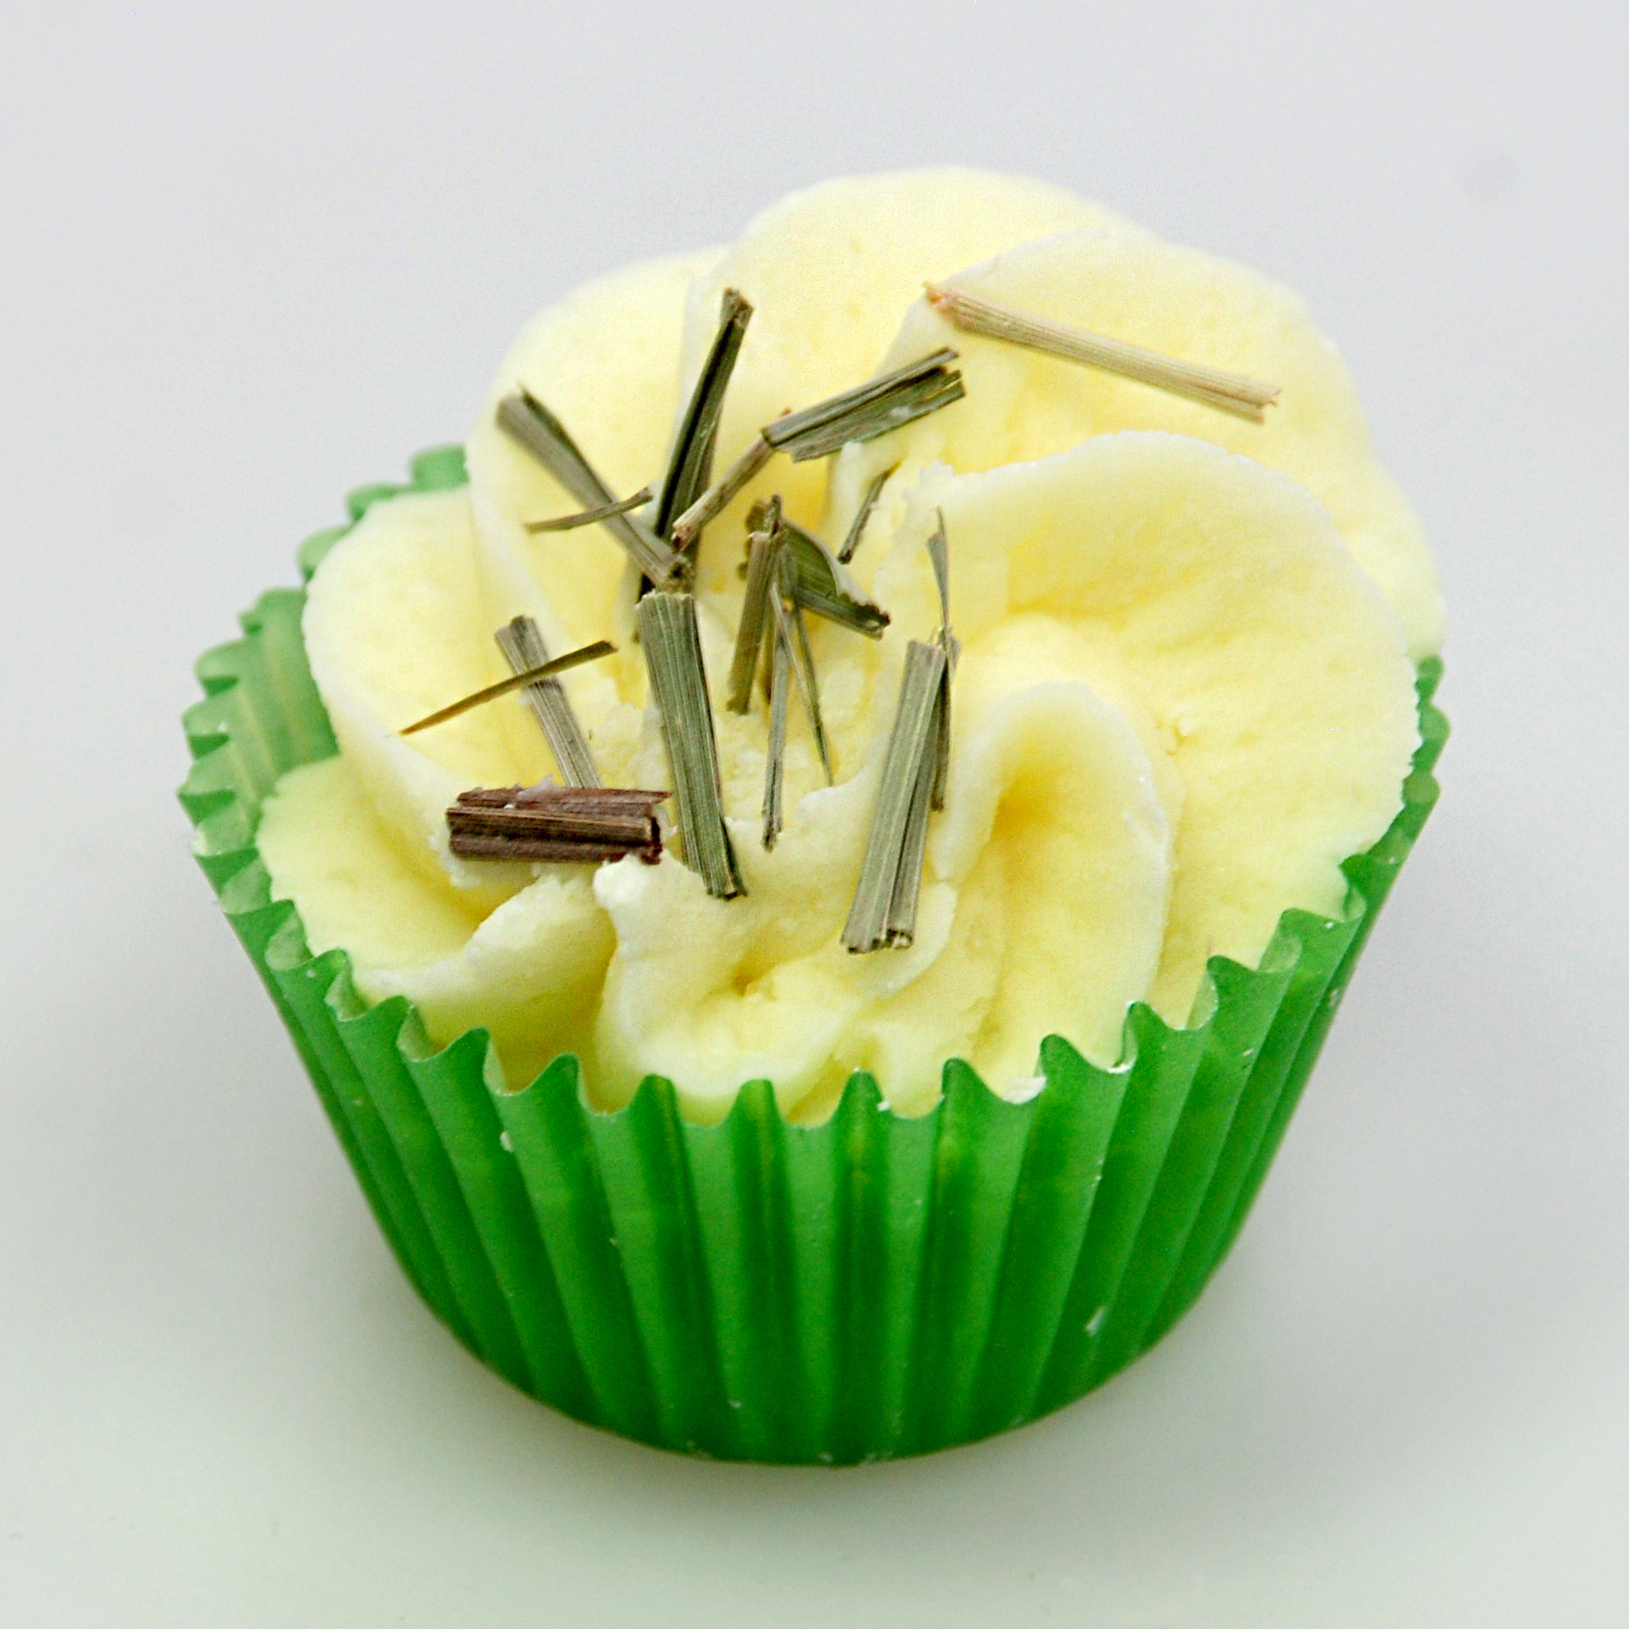 9437LIM-GT Badebutter Cupcake 45g mit Bestreuung Lemongras Duft Limette-Grüner Tee